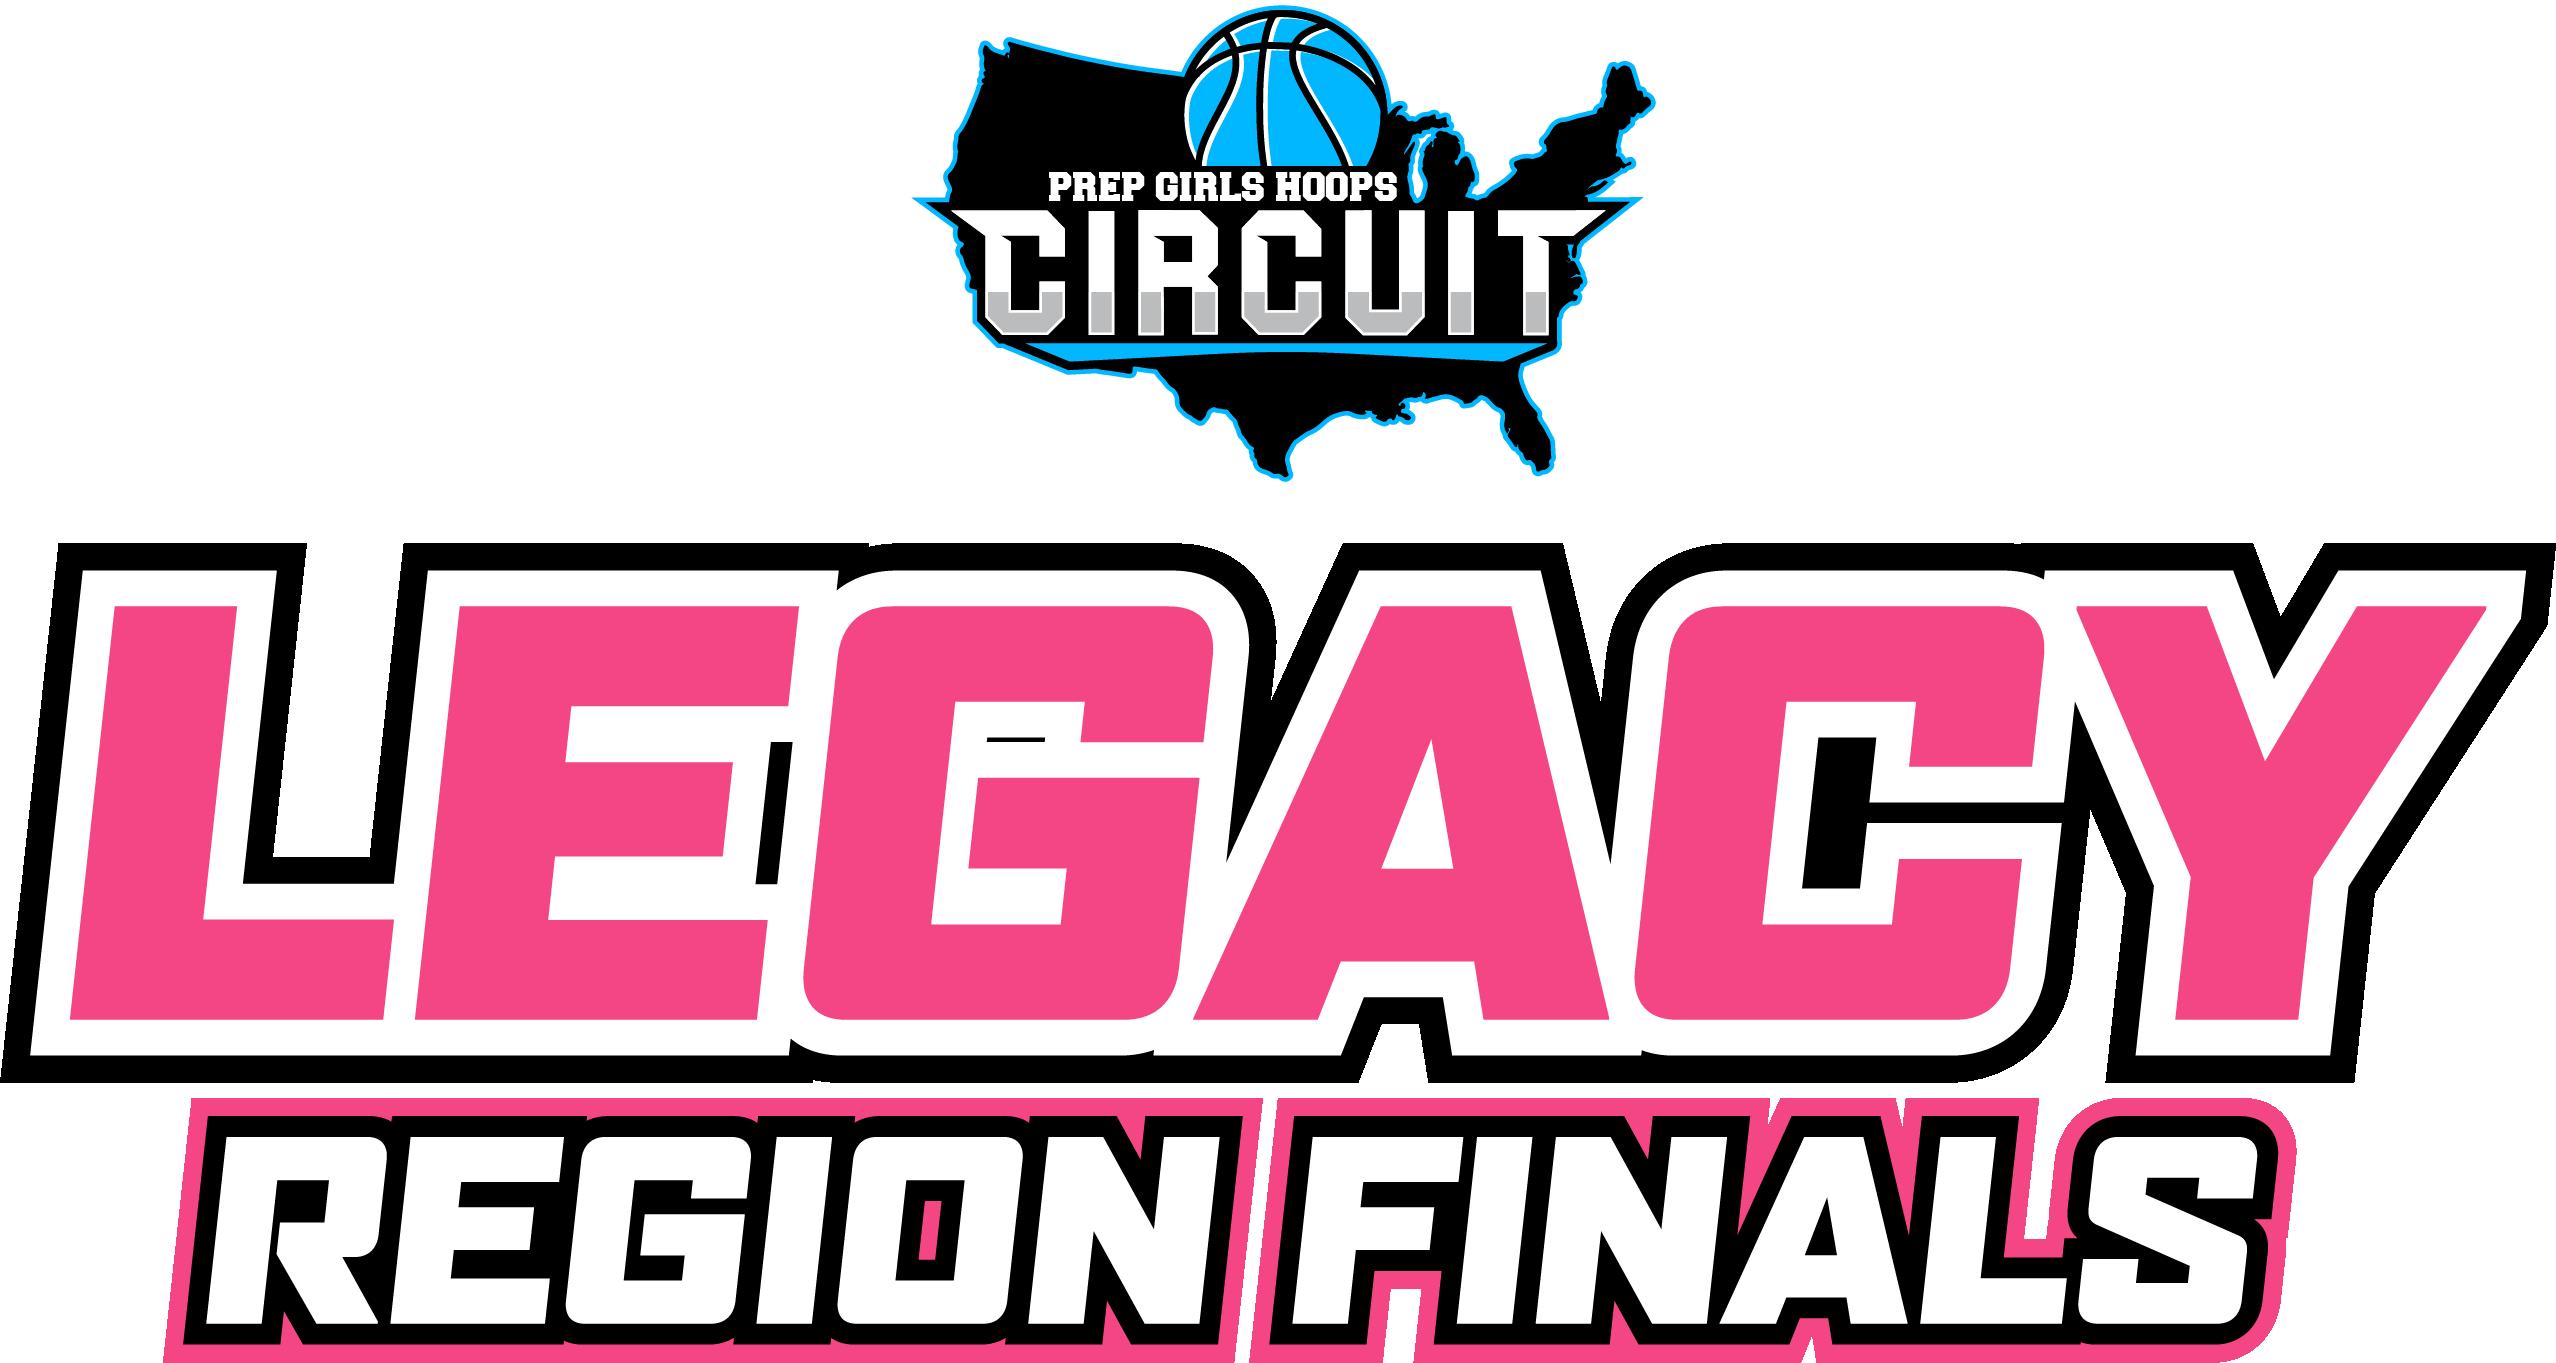 Legacy Region Finals